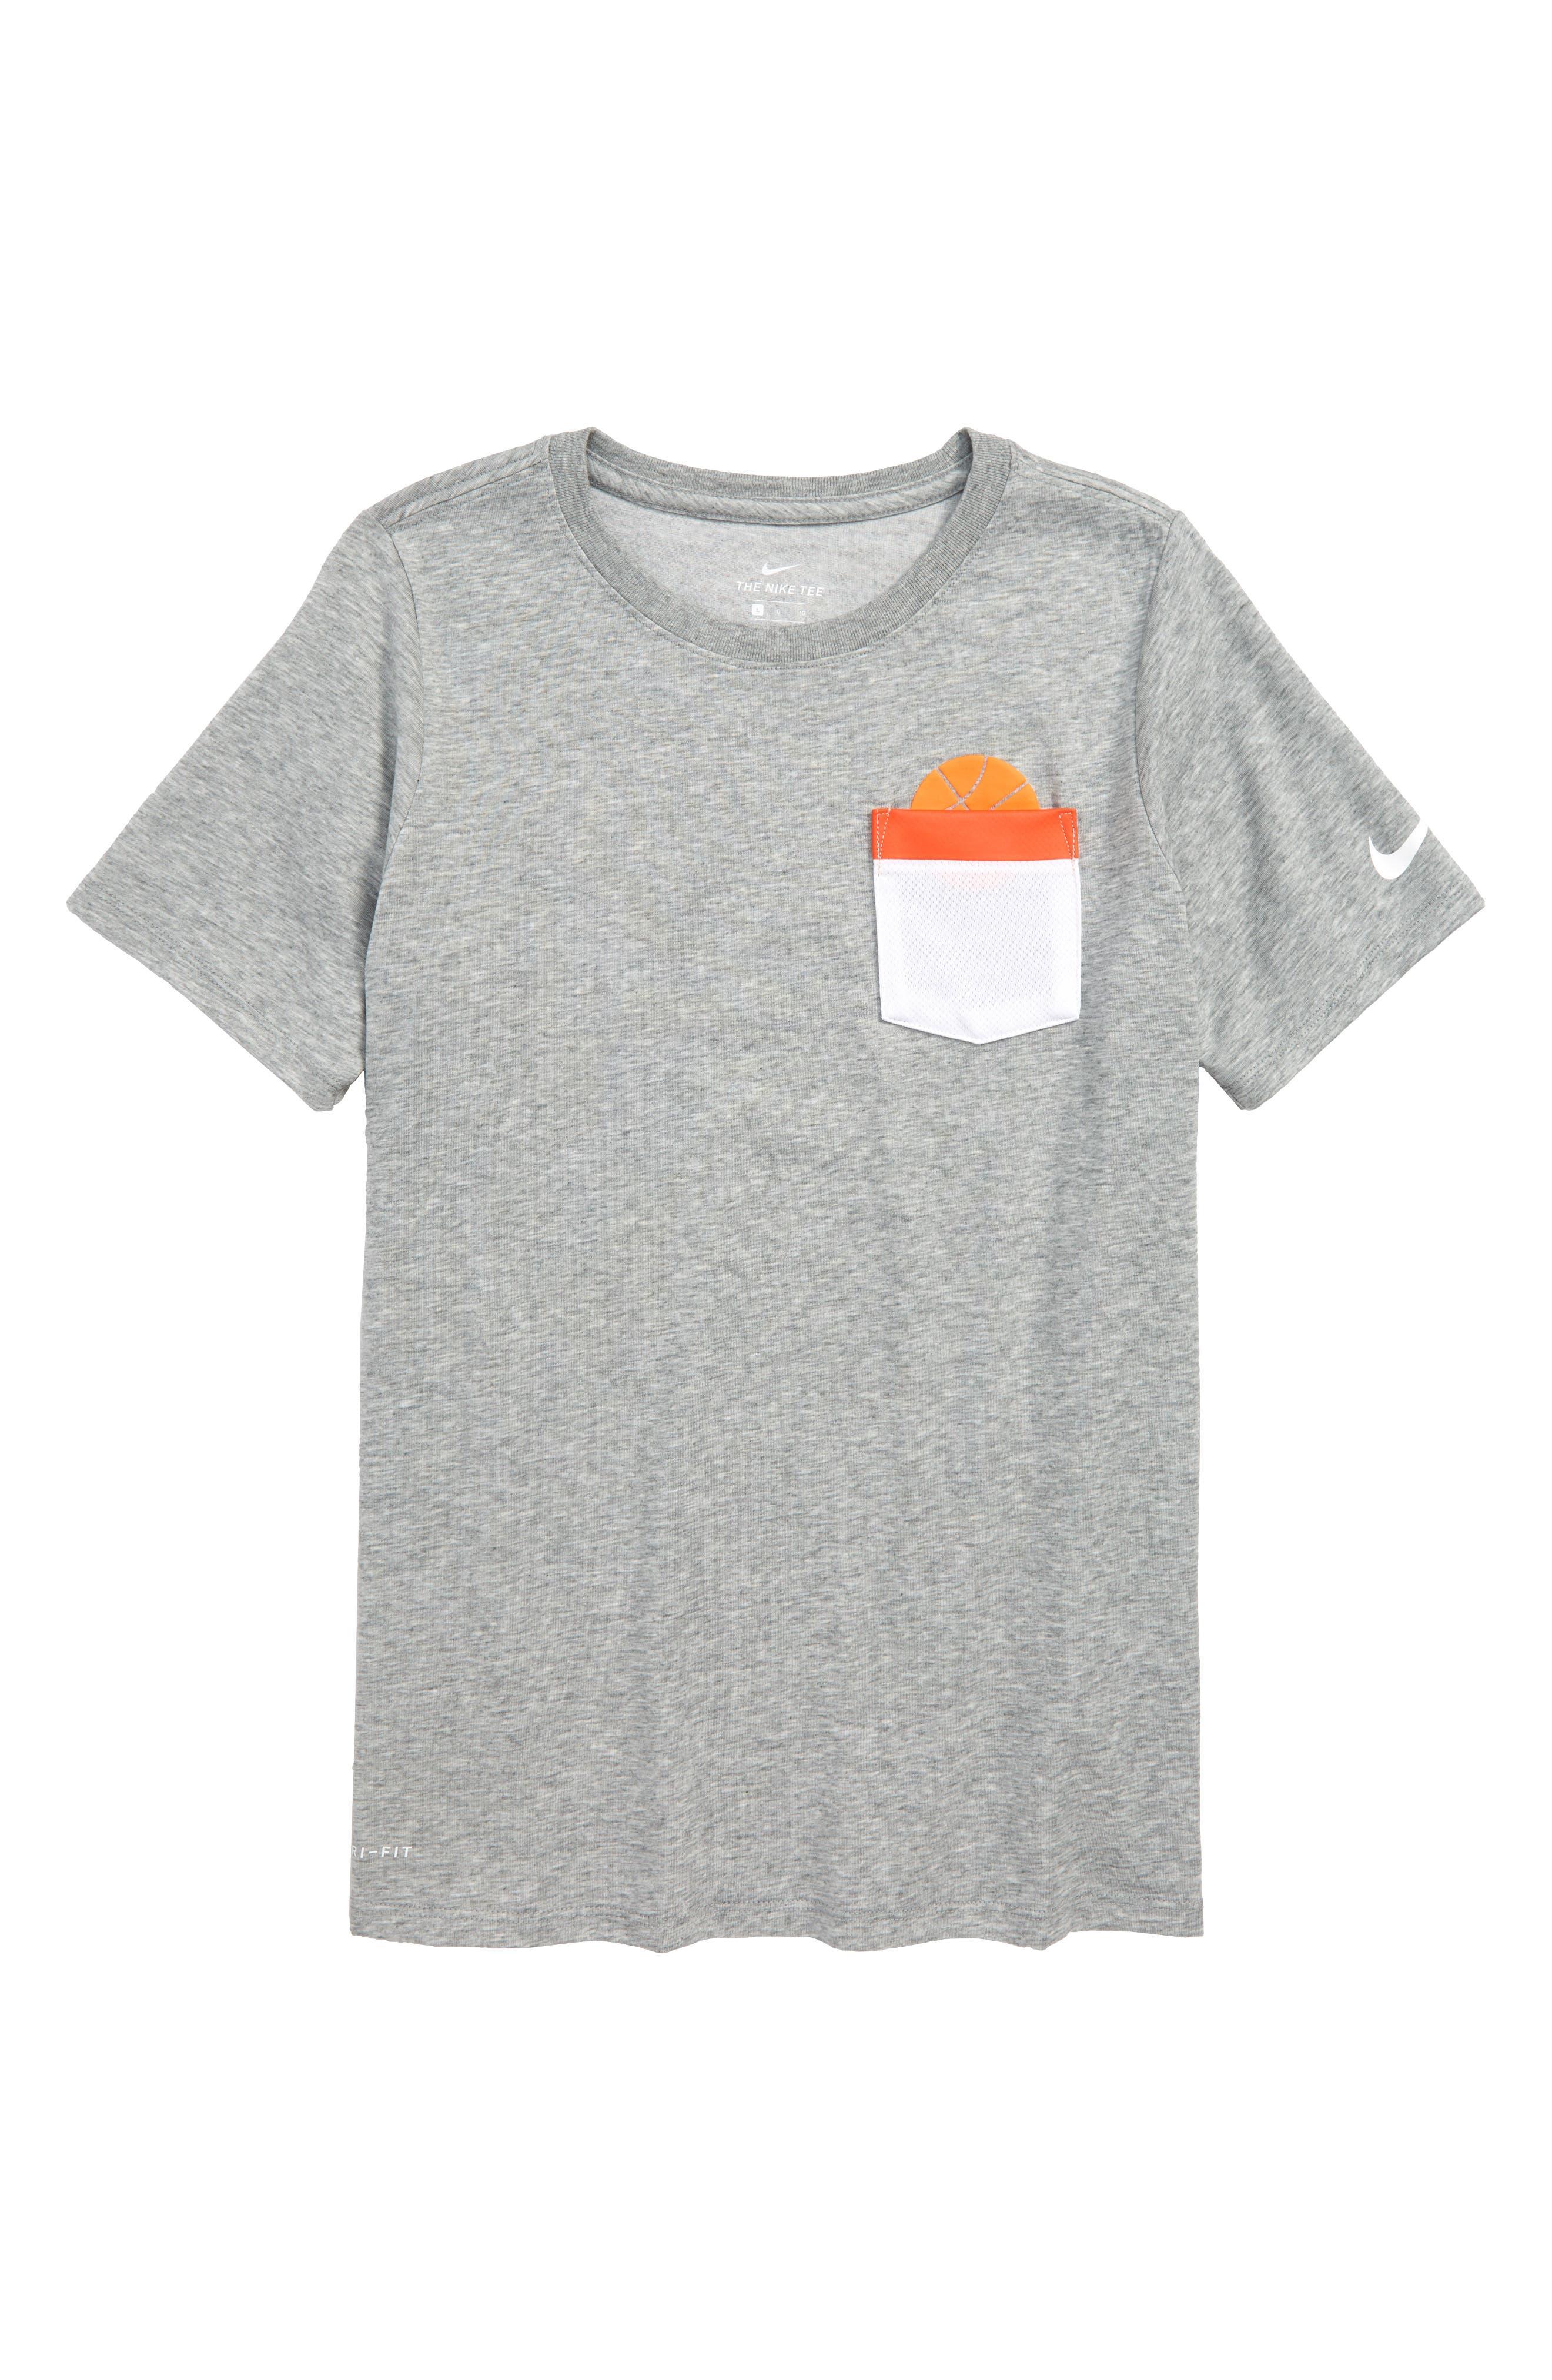 NIKE,                             Dry Graphic T-Shirt,                             Main thumbnail 1, color,                             063